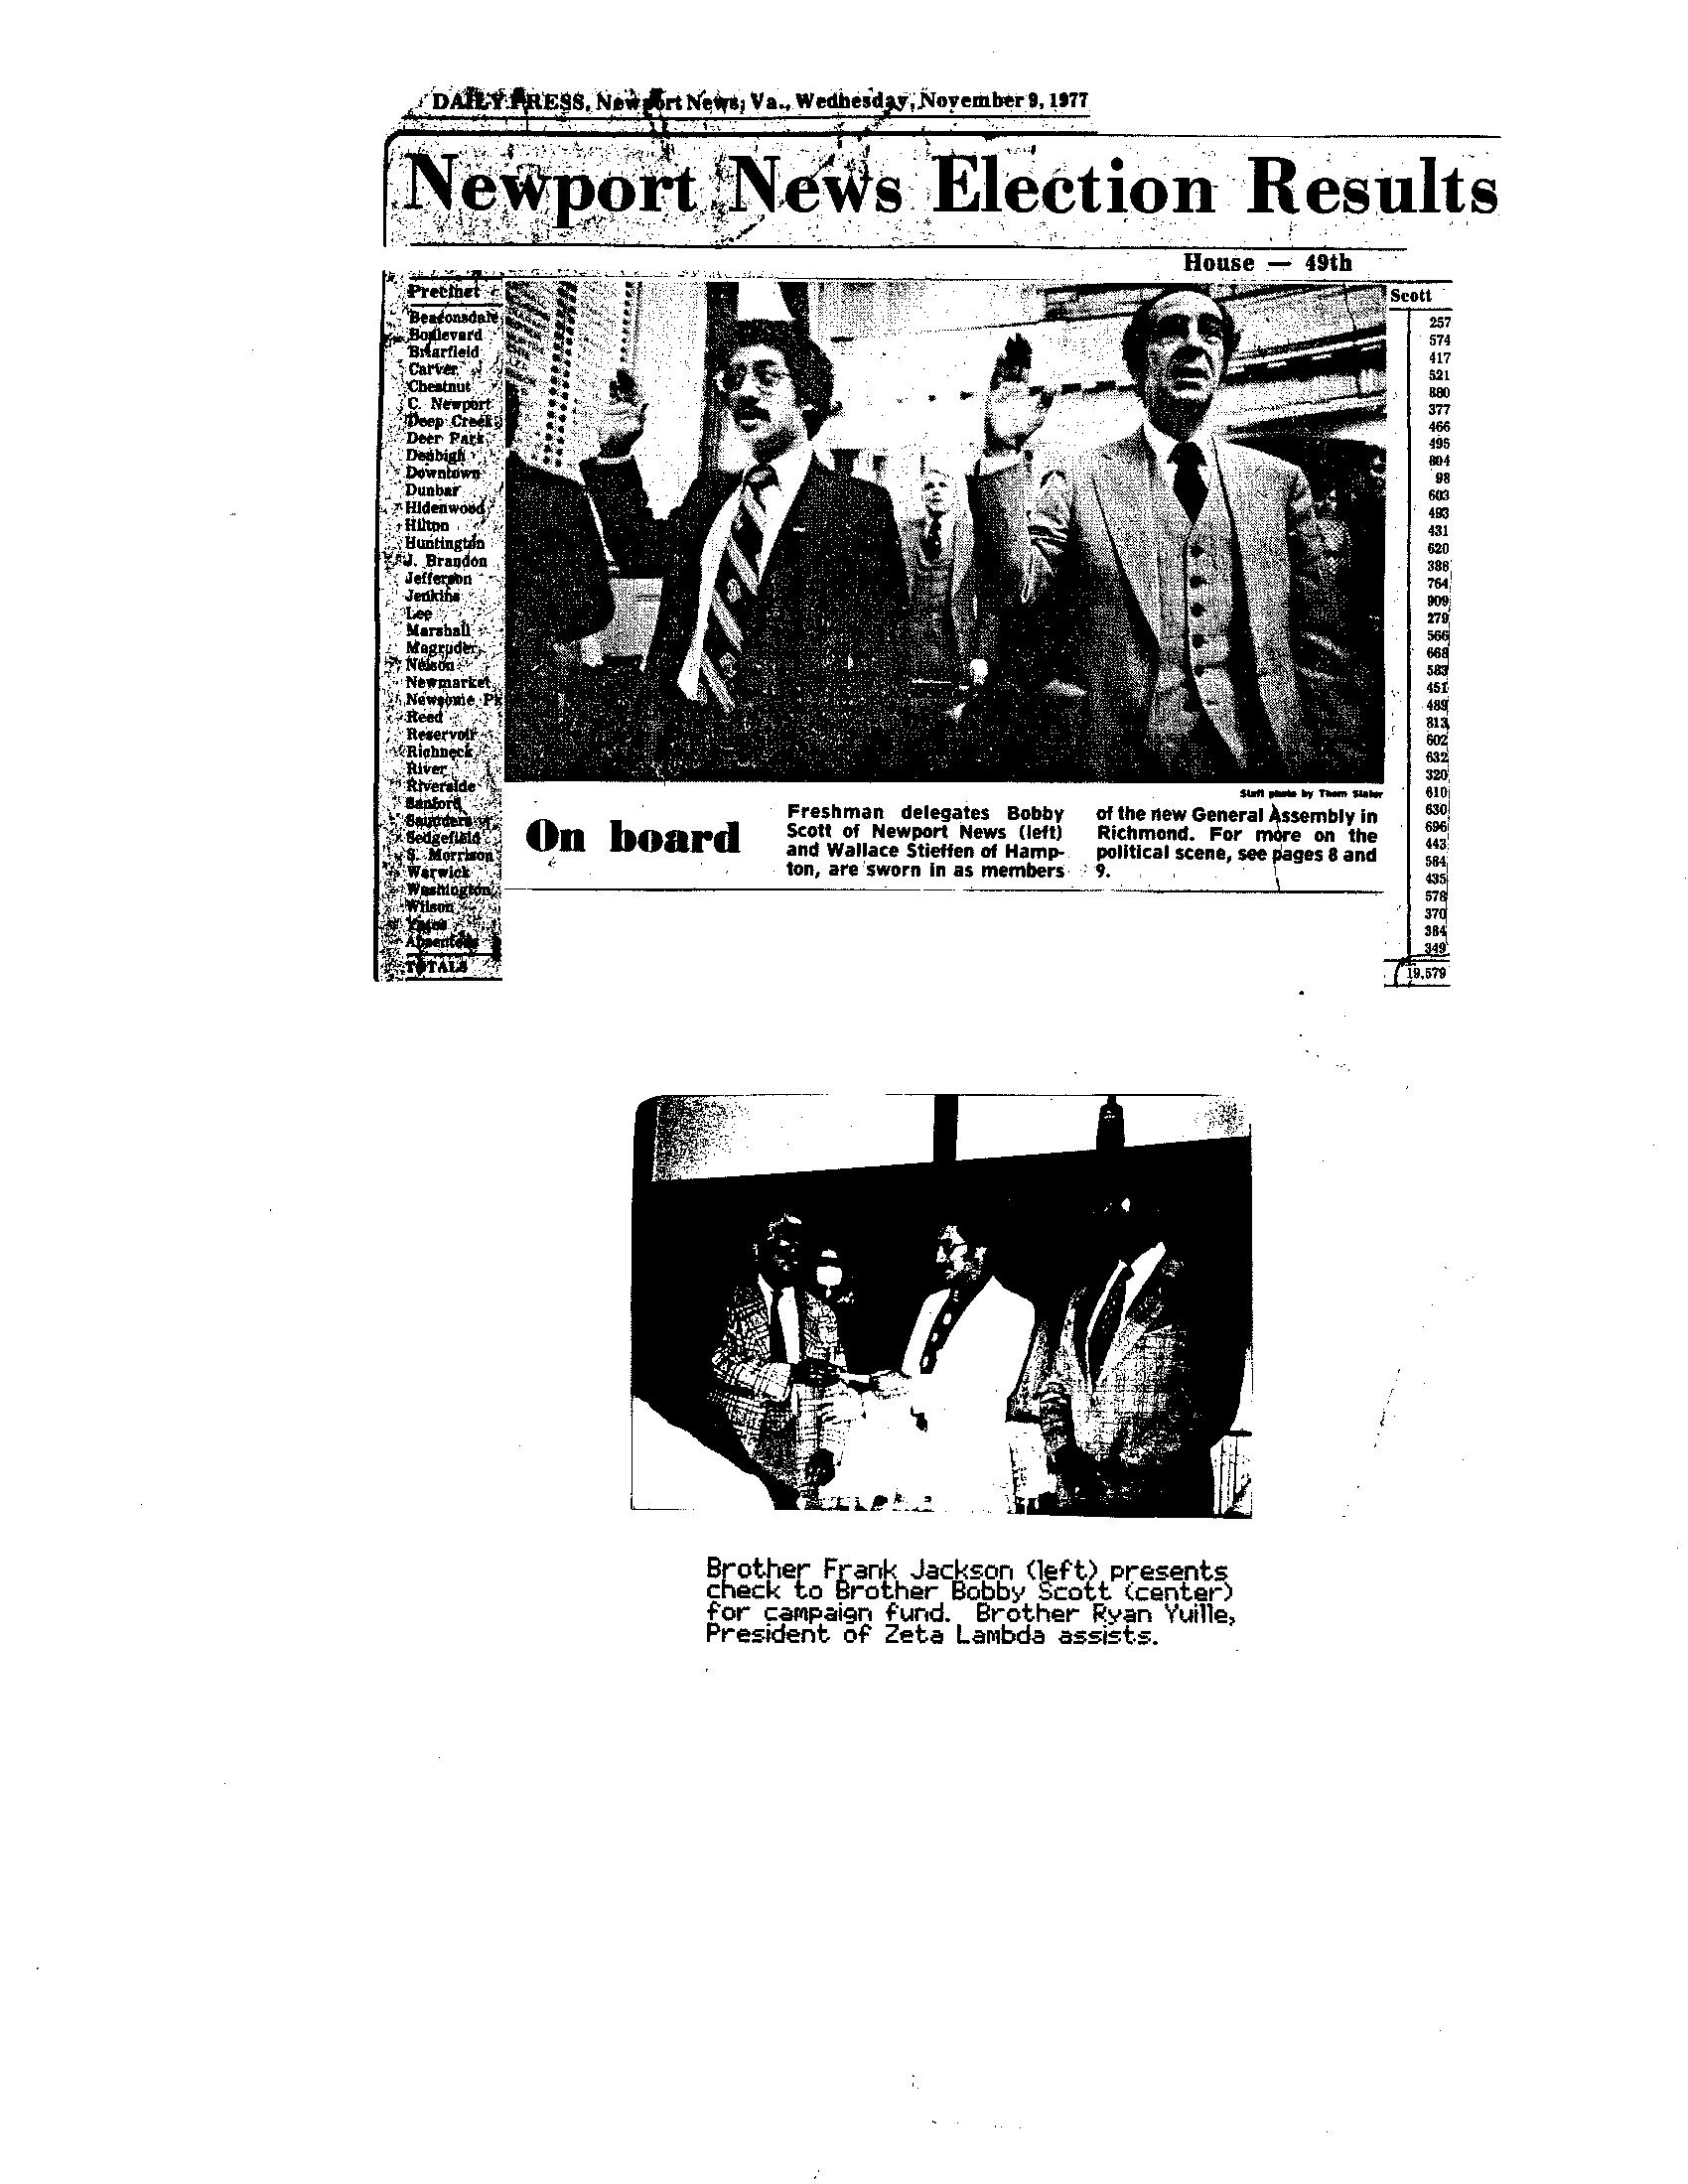 Zeta Lambda 1977 - Bro. Bobby Scott 2.png